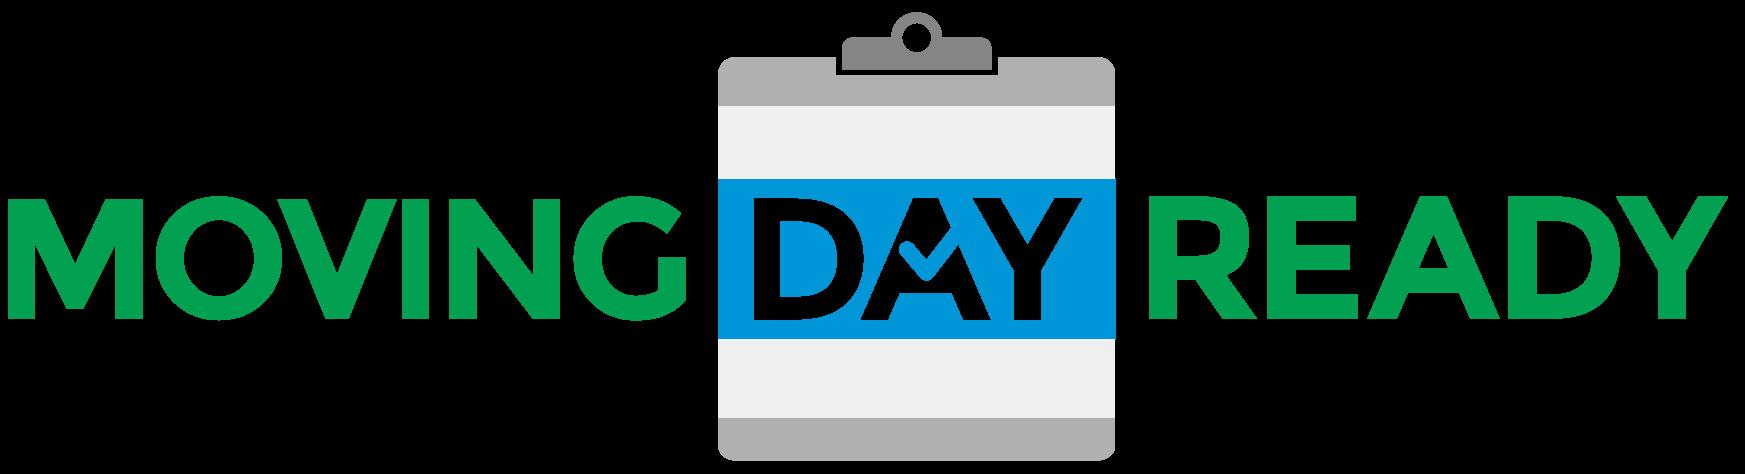 Moving Day Ready Logo